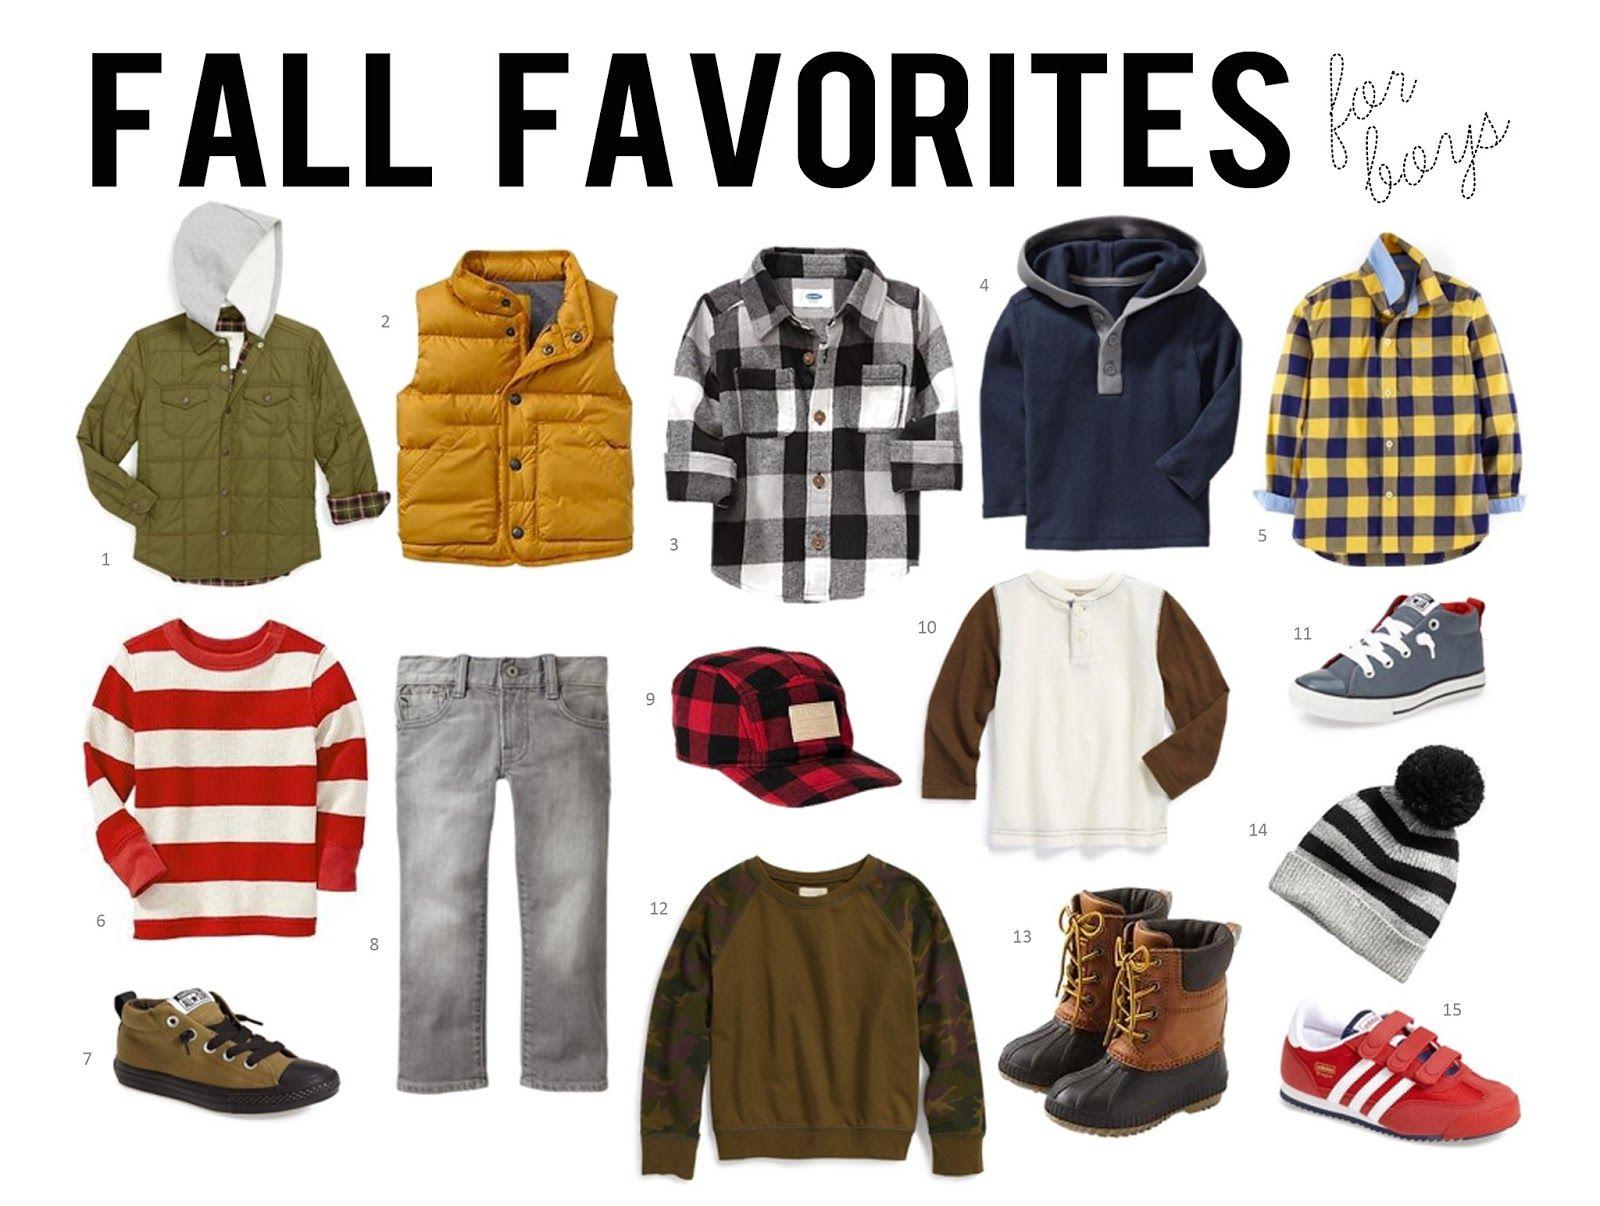 Fall Favorites For Boys l i t t l e g e n t s